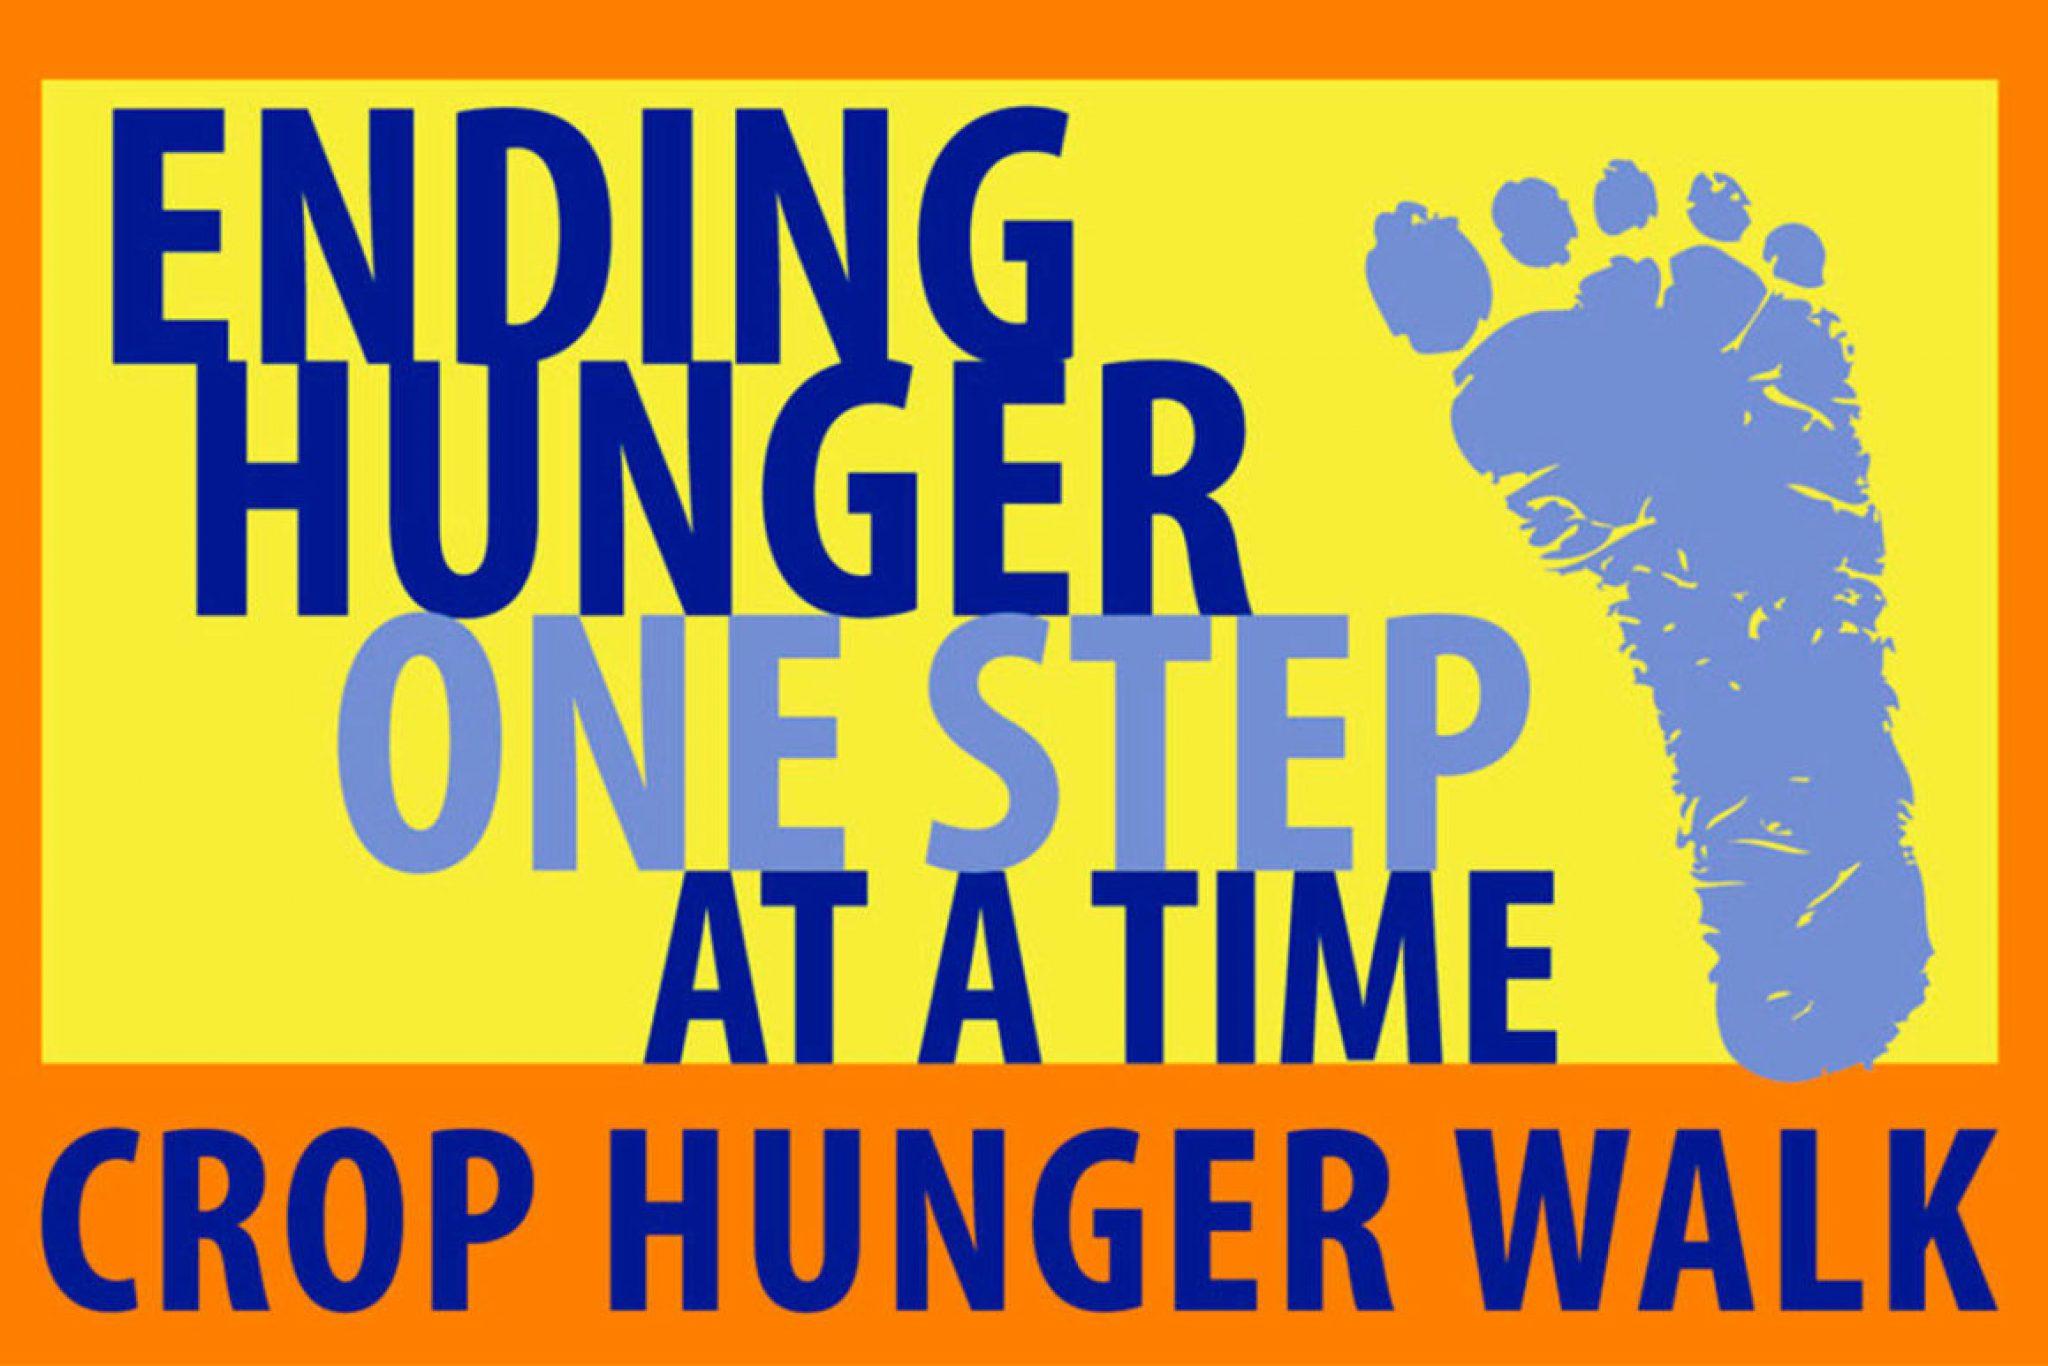 Crop Hunger Walk October 4